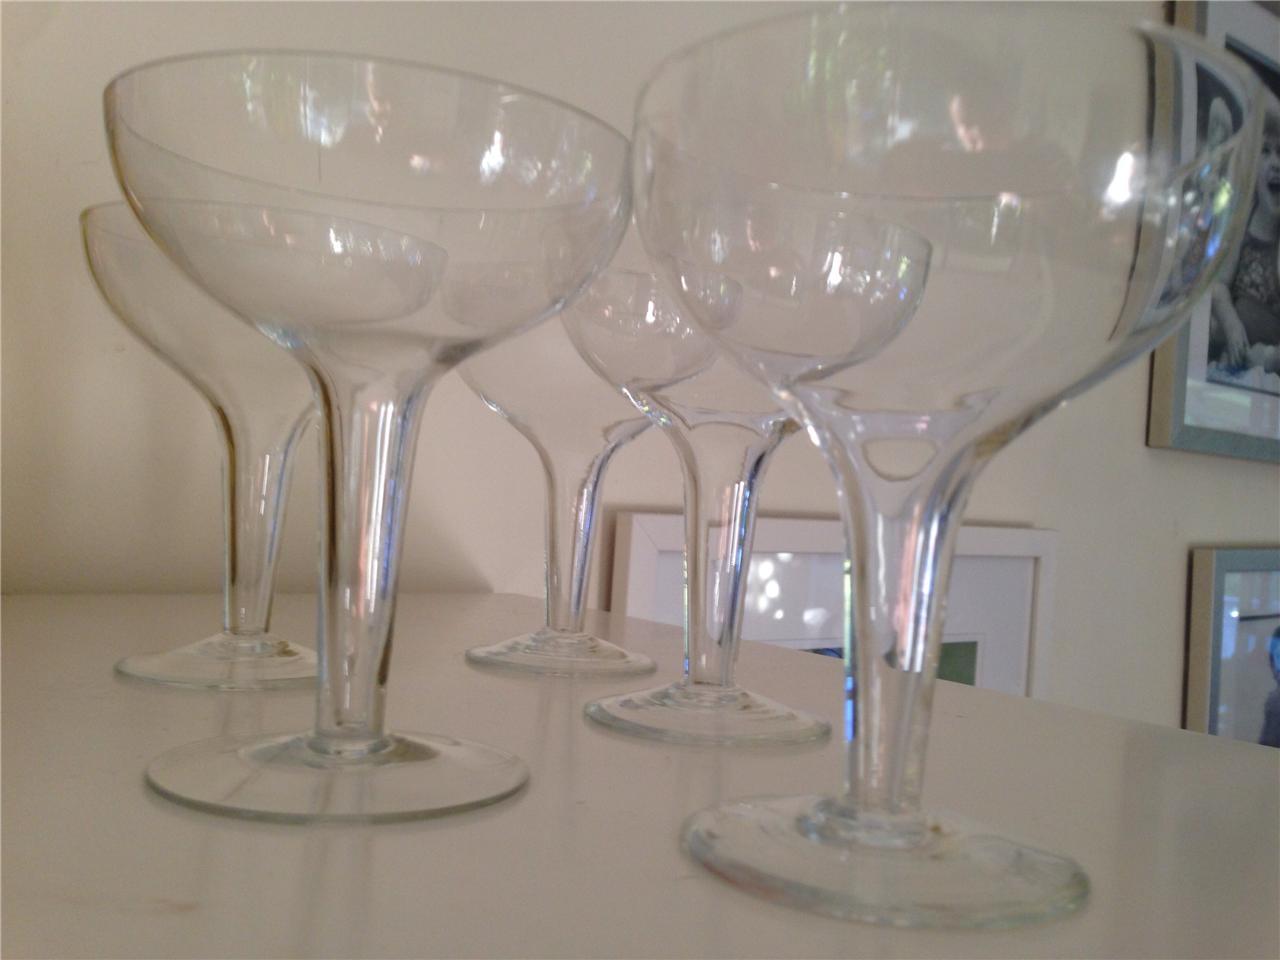 Vintage champagne glass hollow stem retro glasses 50s cocktail flutes ebay - Champagne flutes hollow stem ...